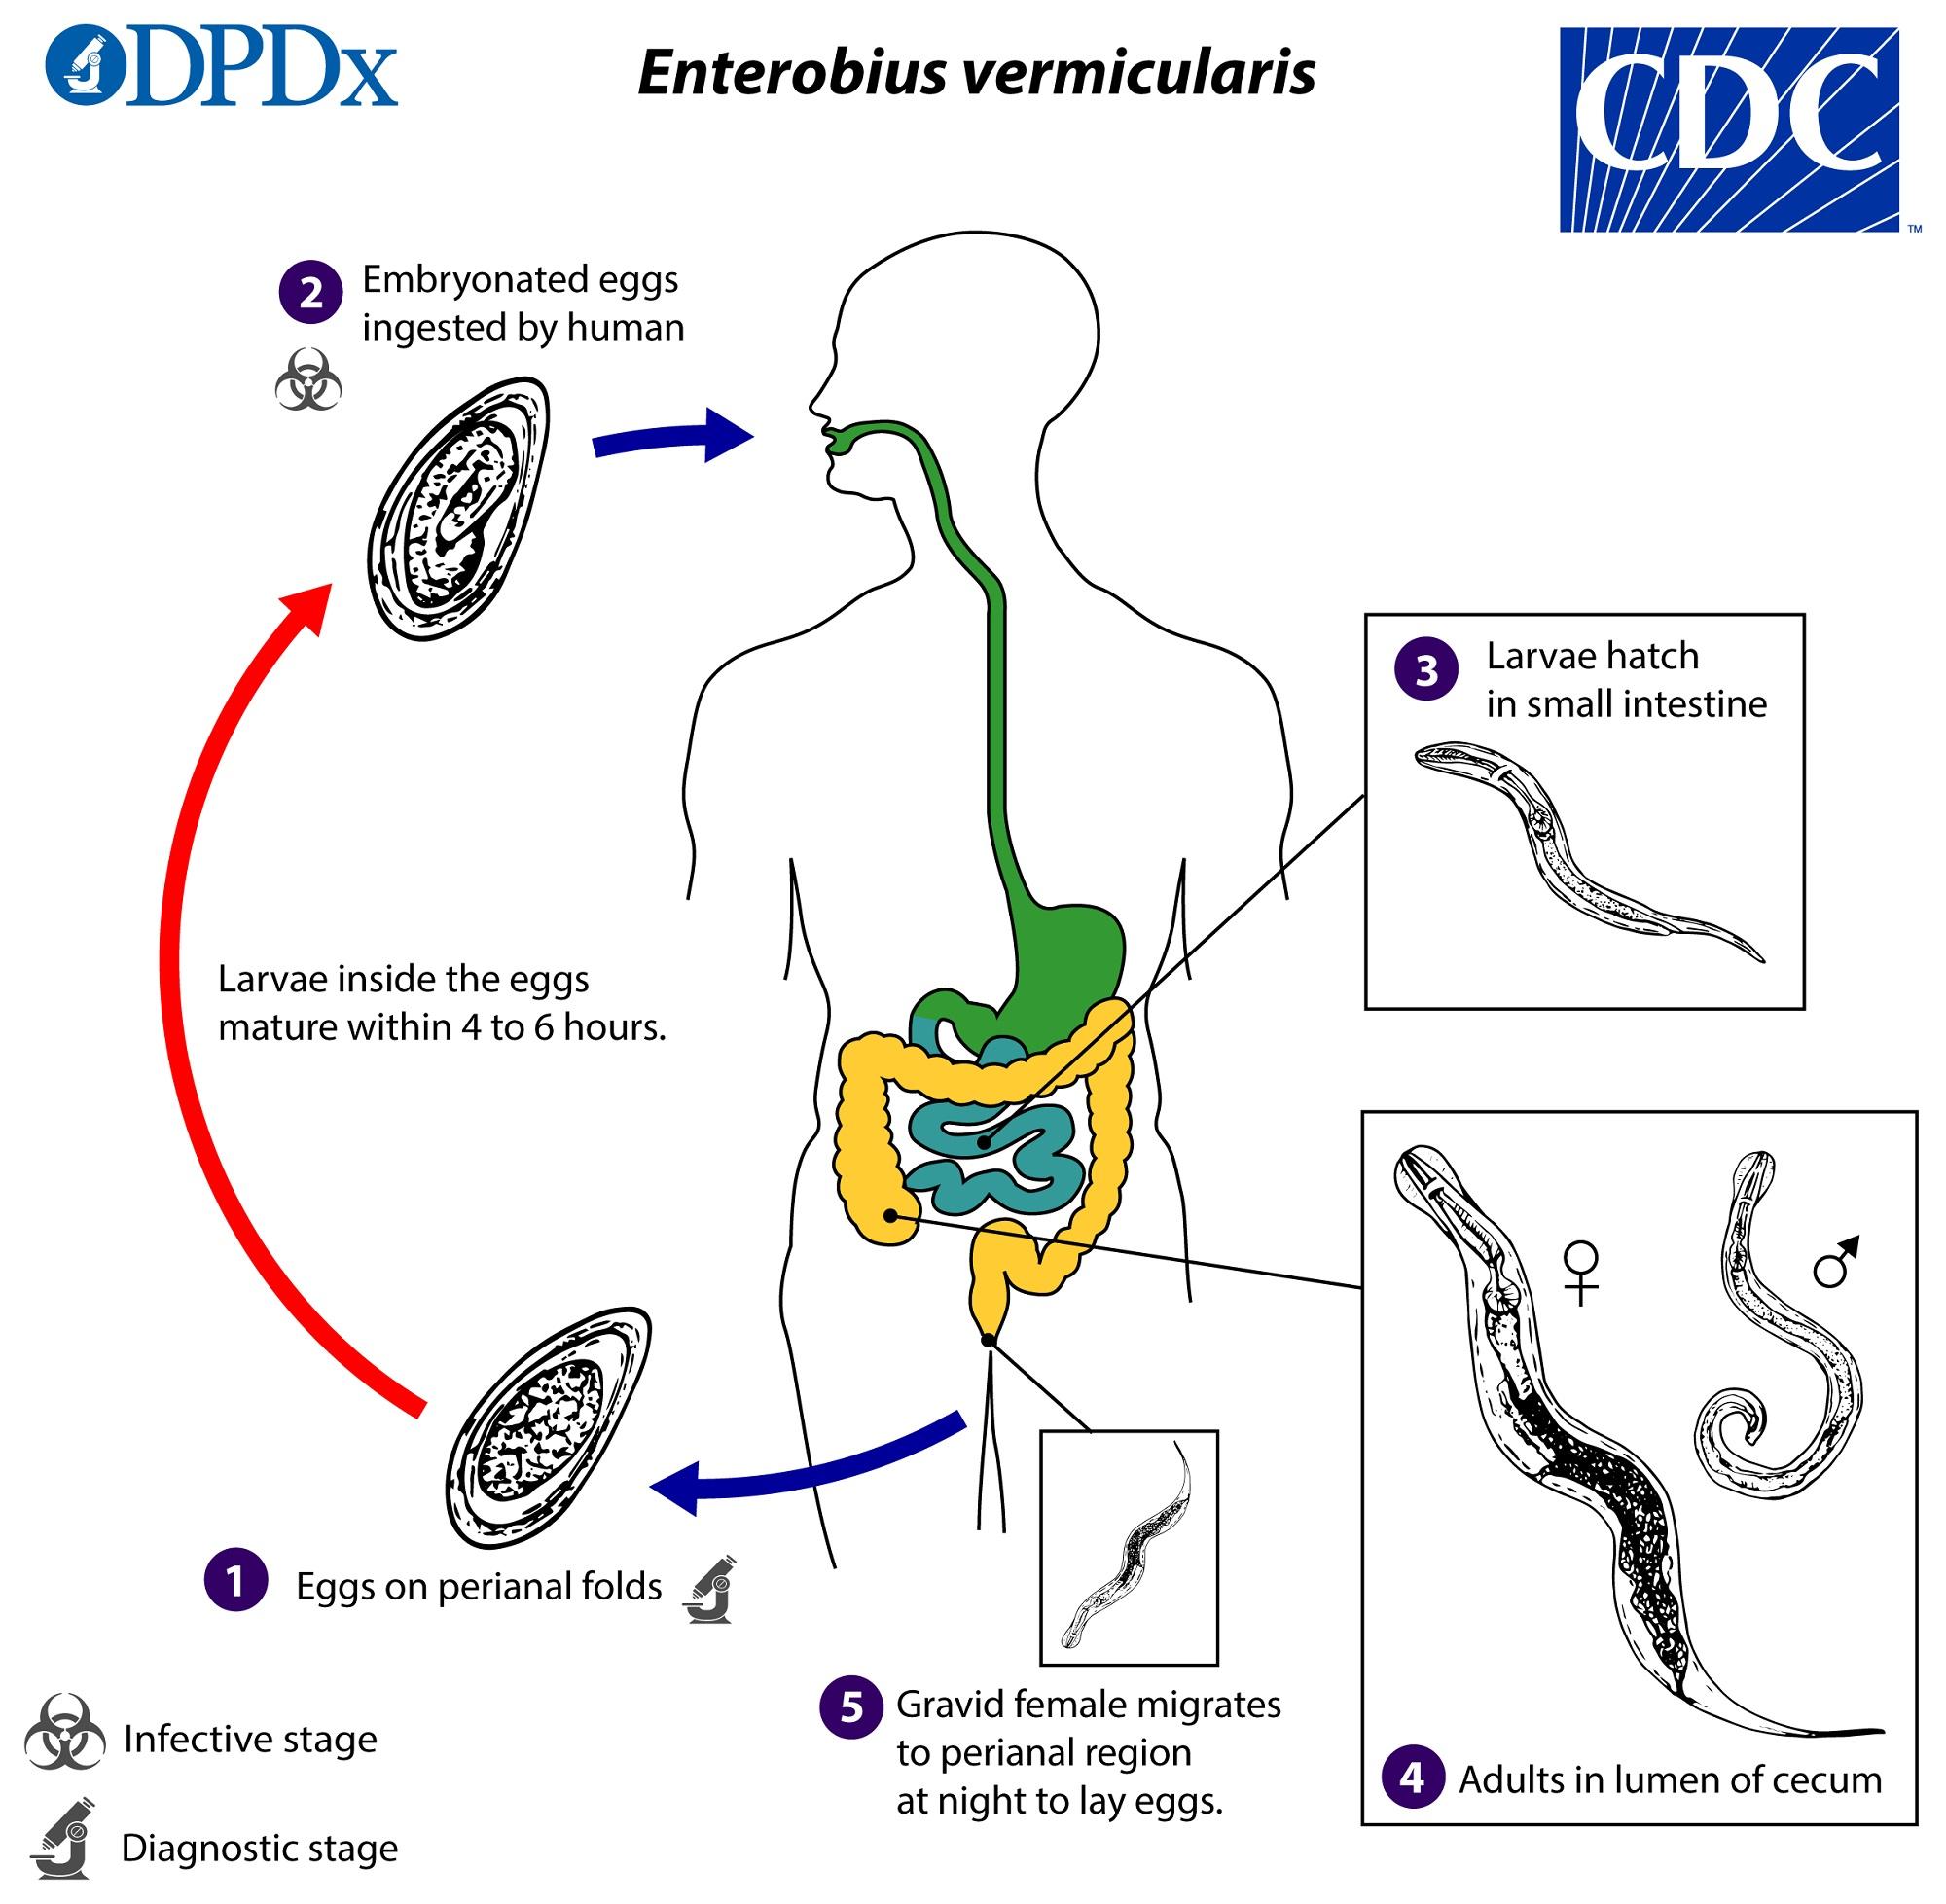 enterobius vermicularis jelzett hpv vírus pap 3